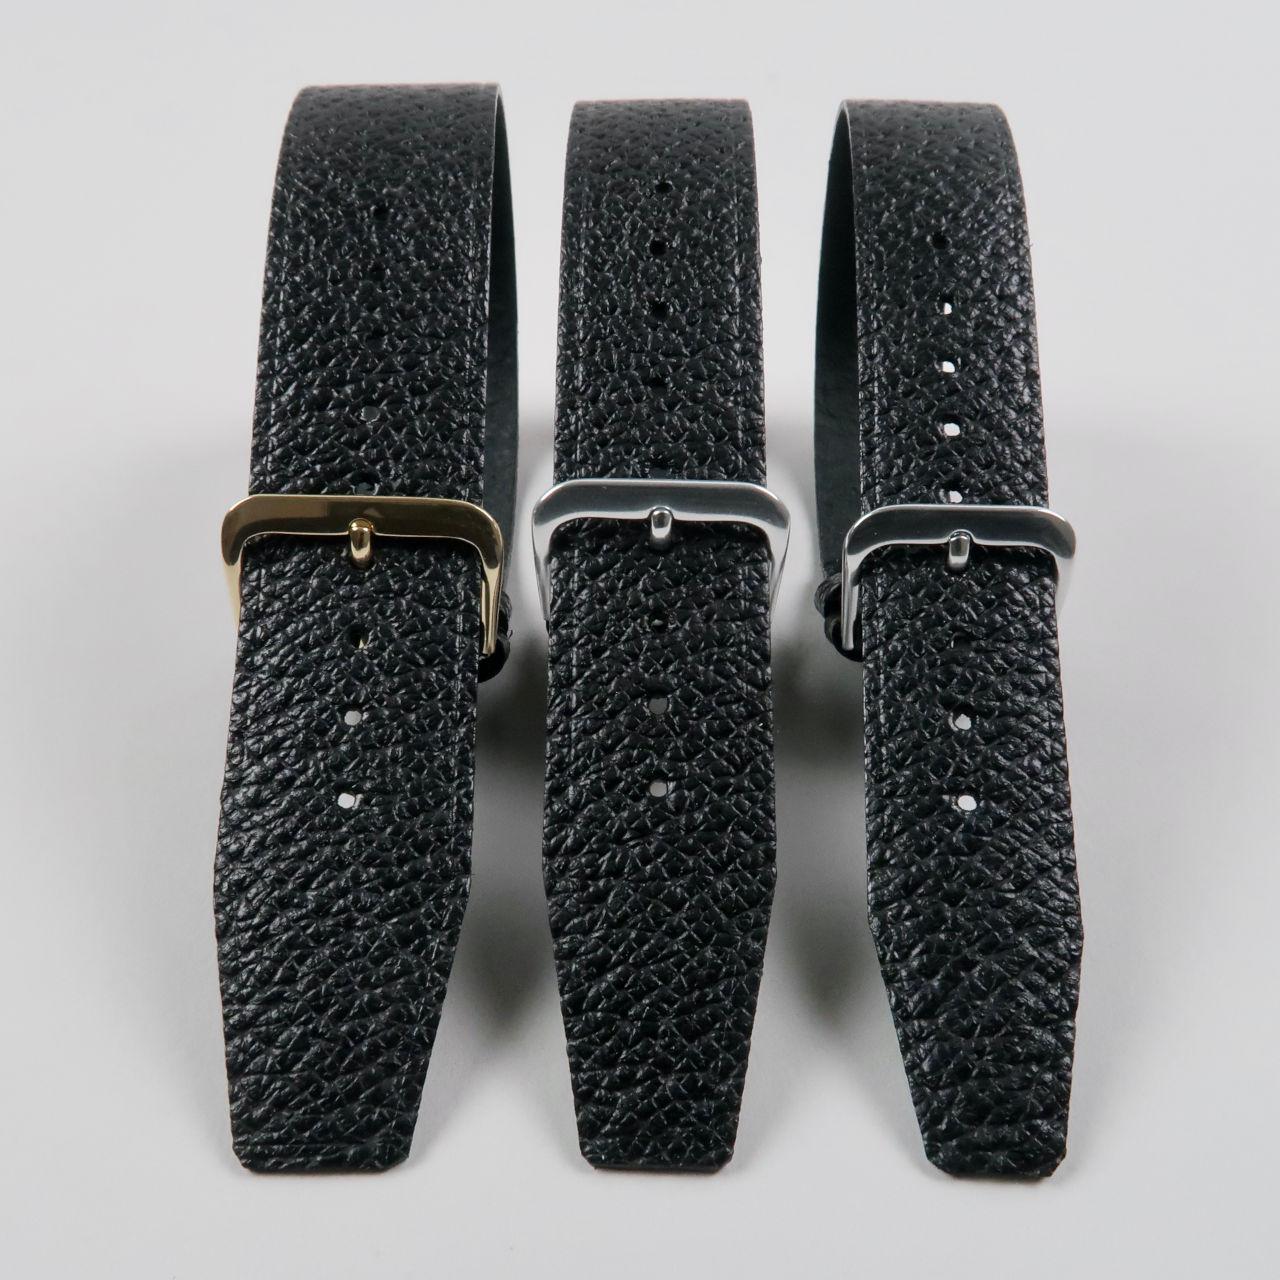 Christopher Clarke for Black Bough handmade wild boar pull-through watch straps